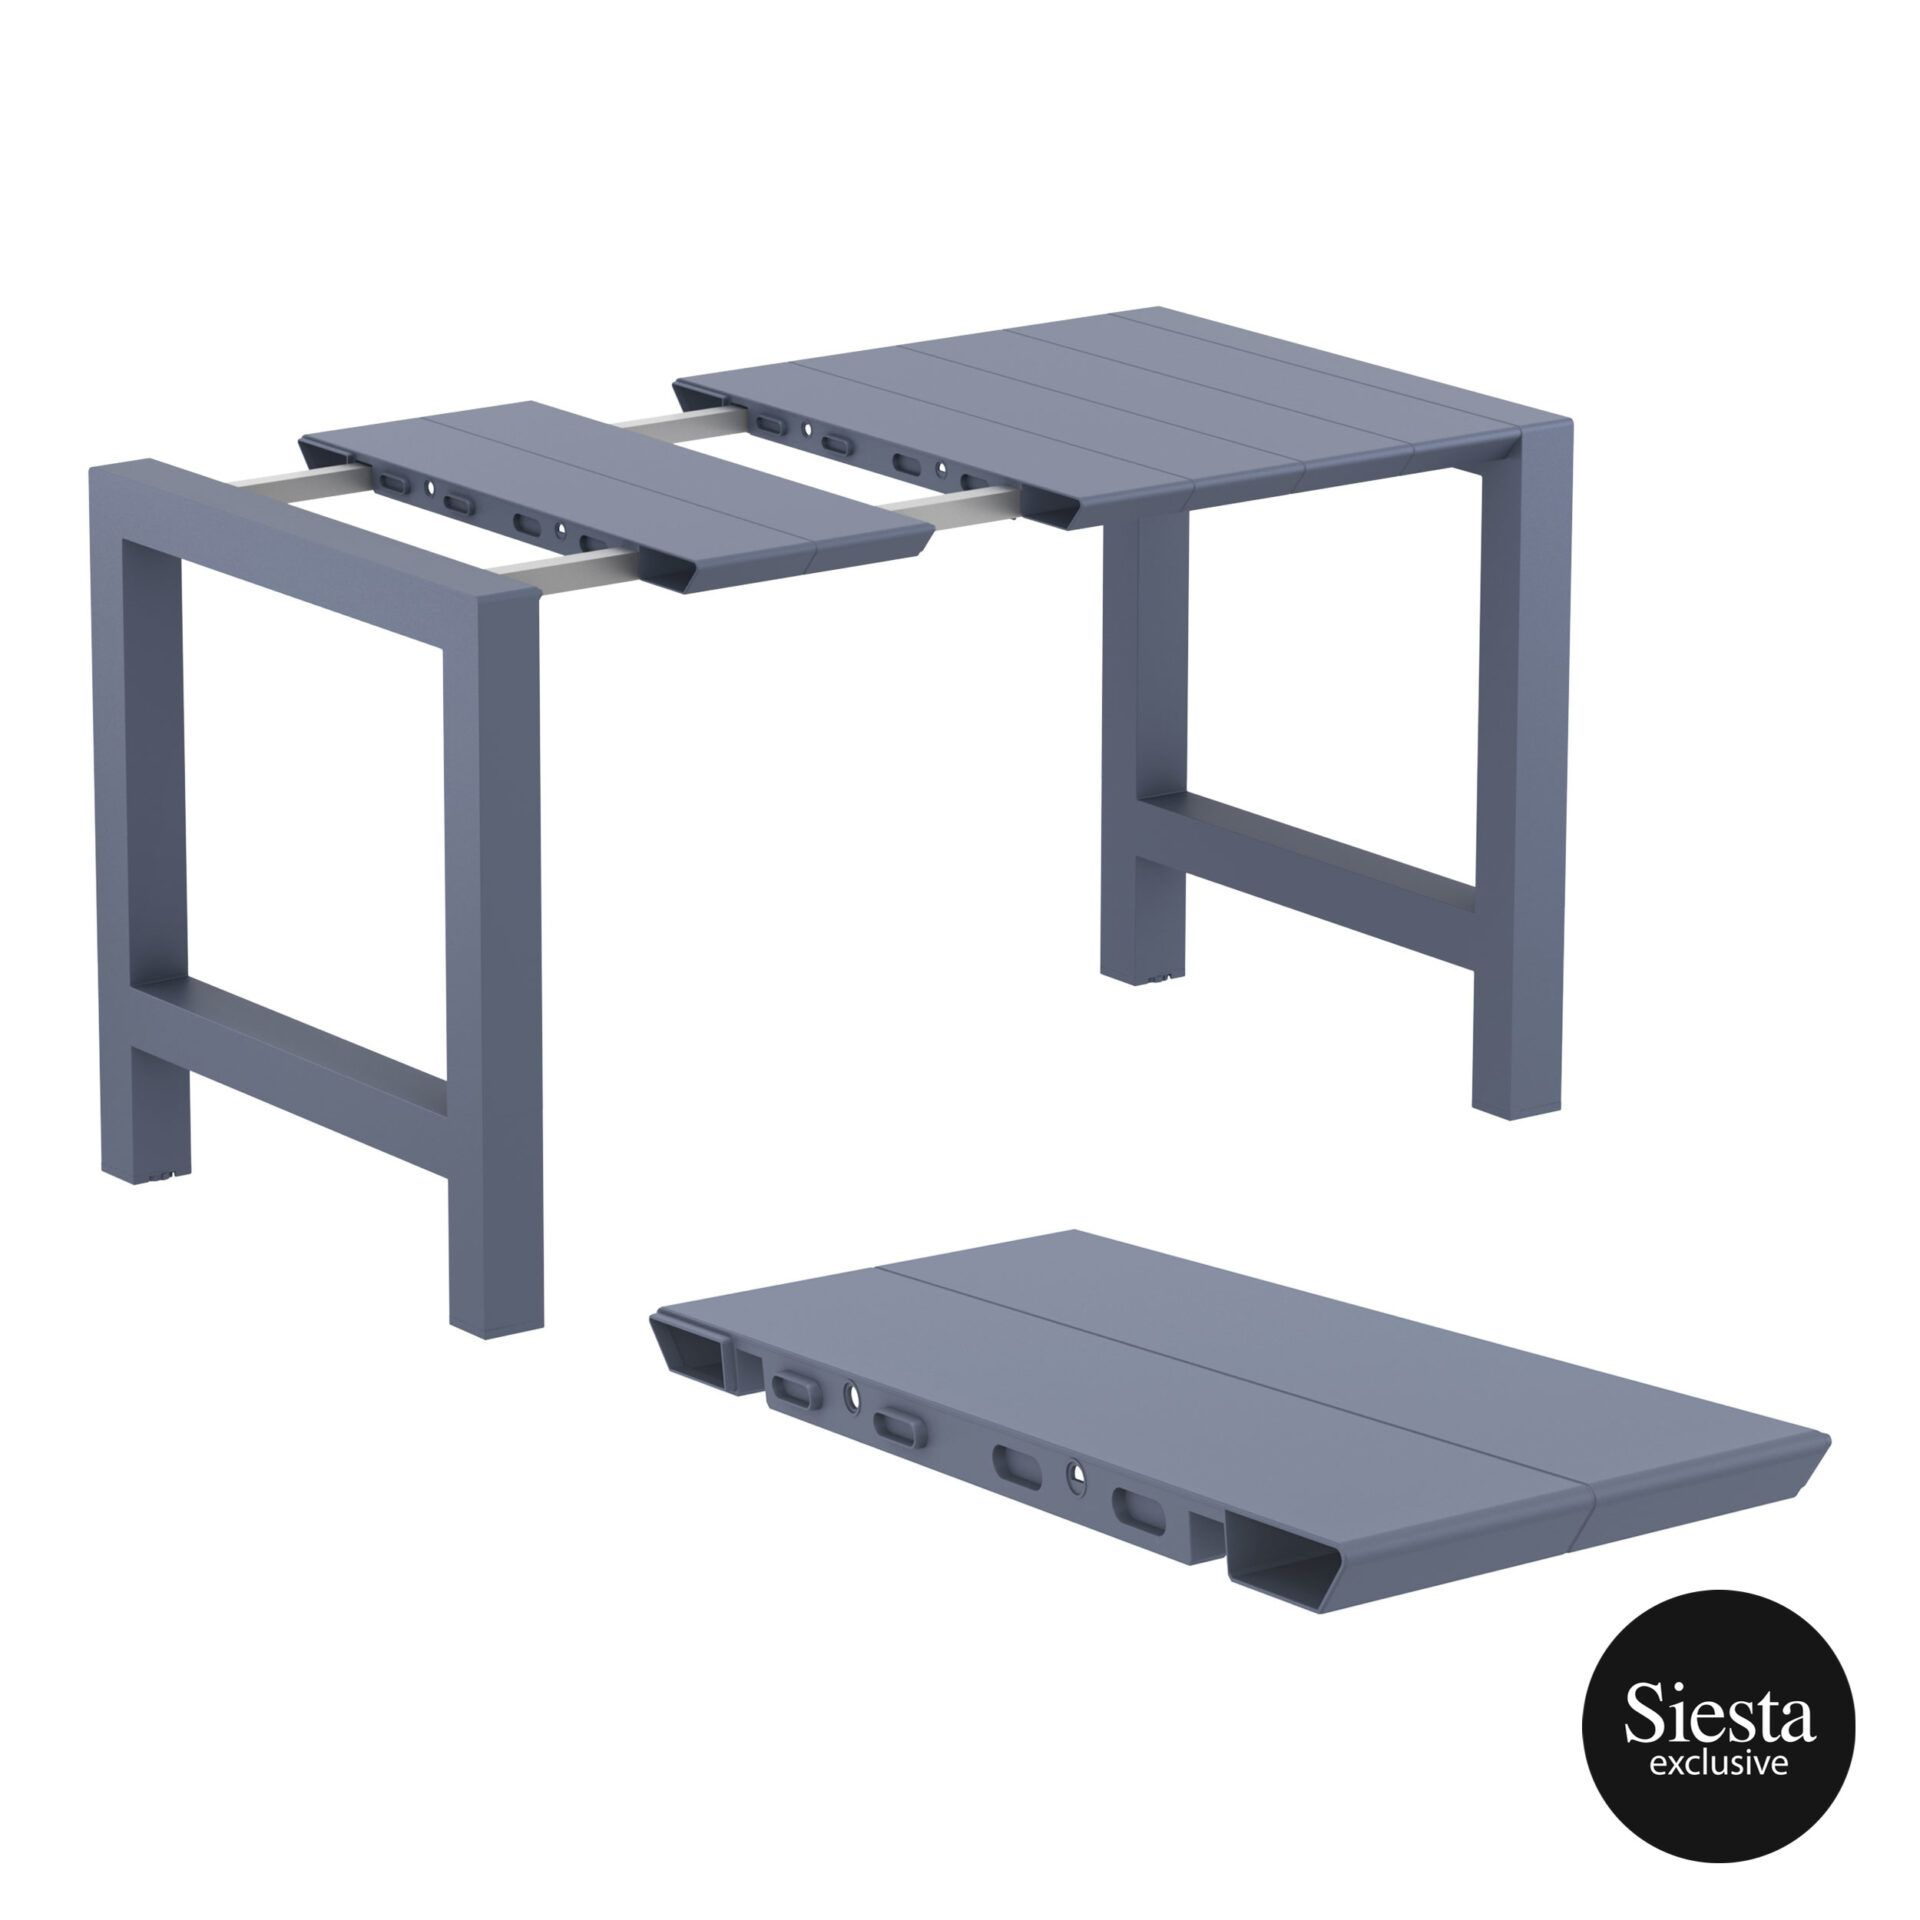 005 vegas bar table 140 darkgrey extension part